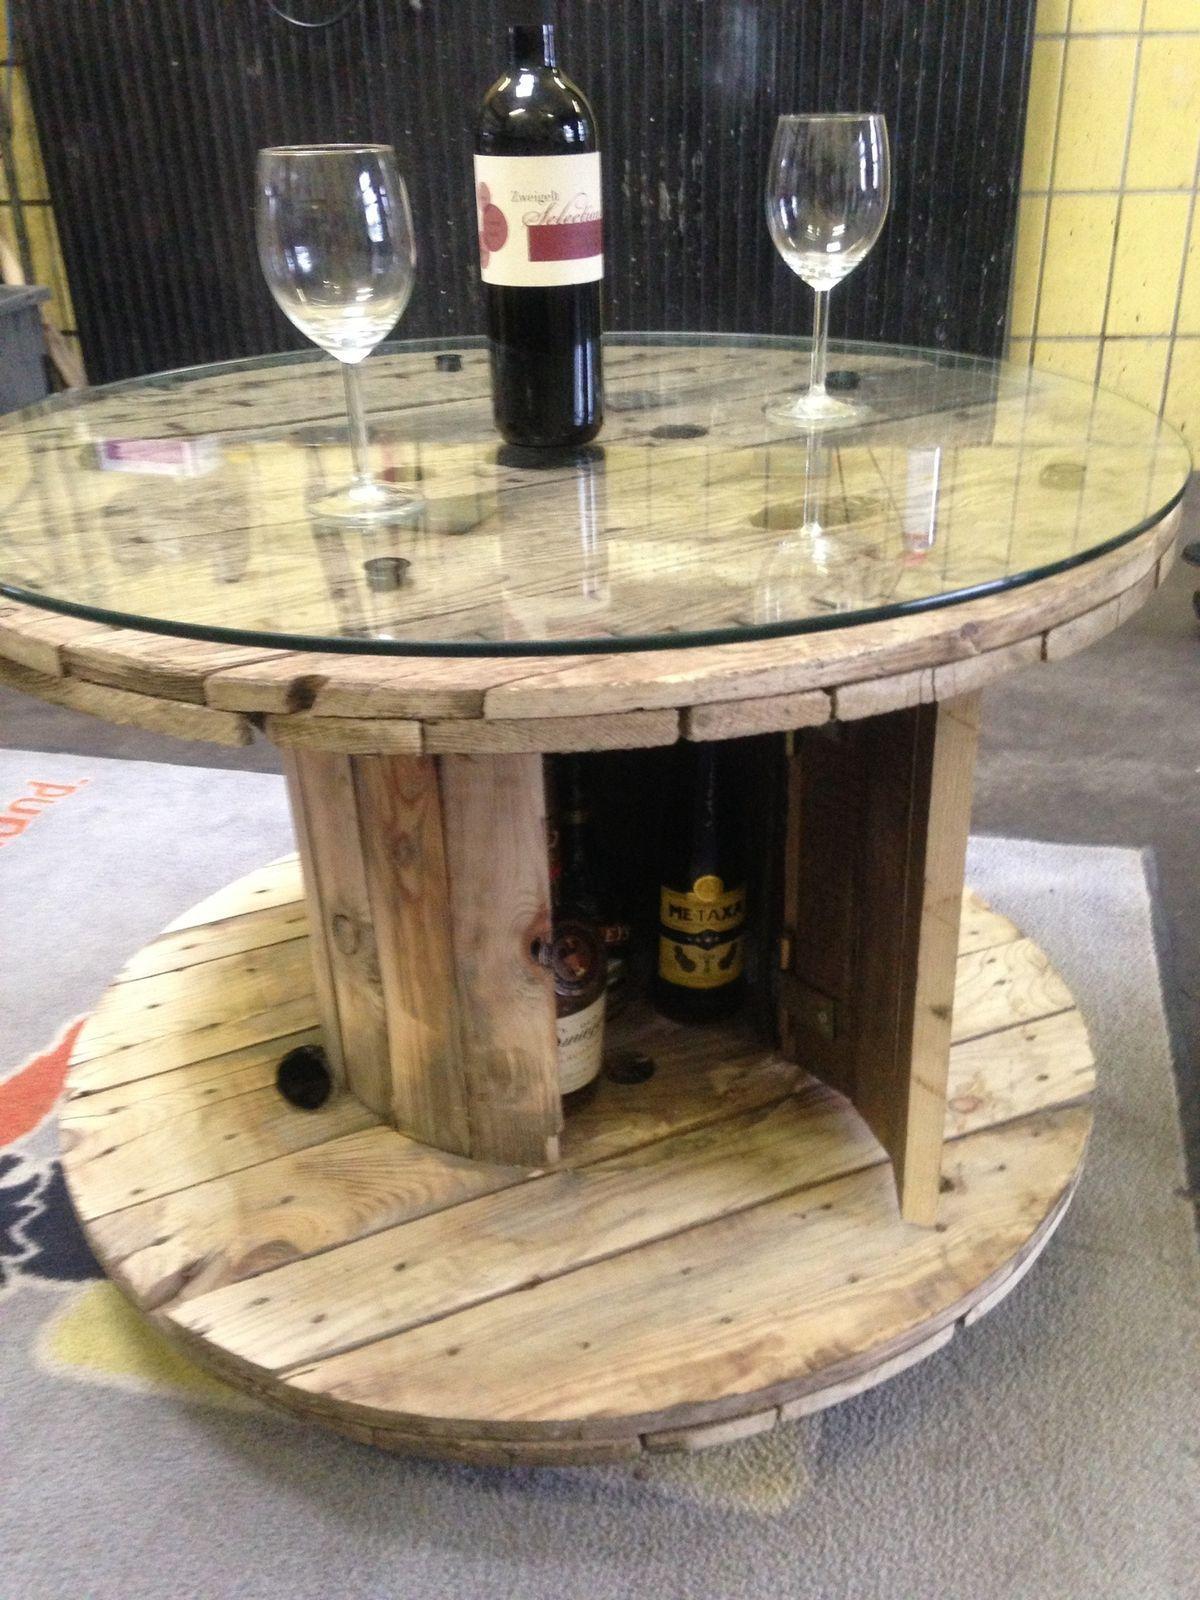 Kabeltrommel tisch kabeltrommel carrete de madera for Europaletten mobel tisch